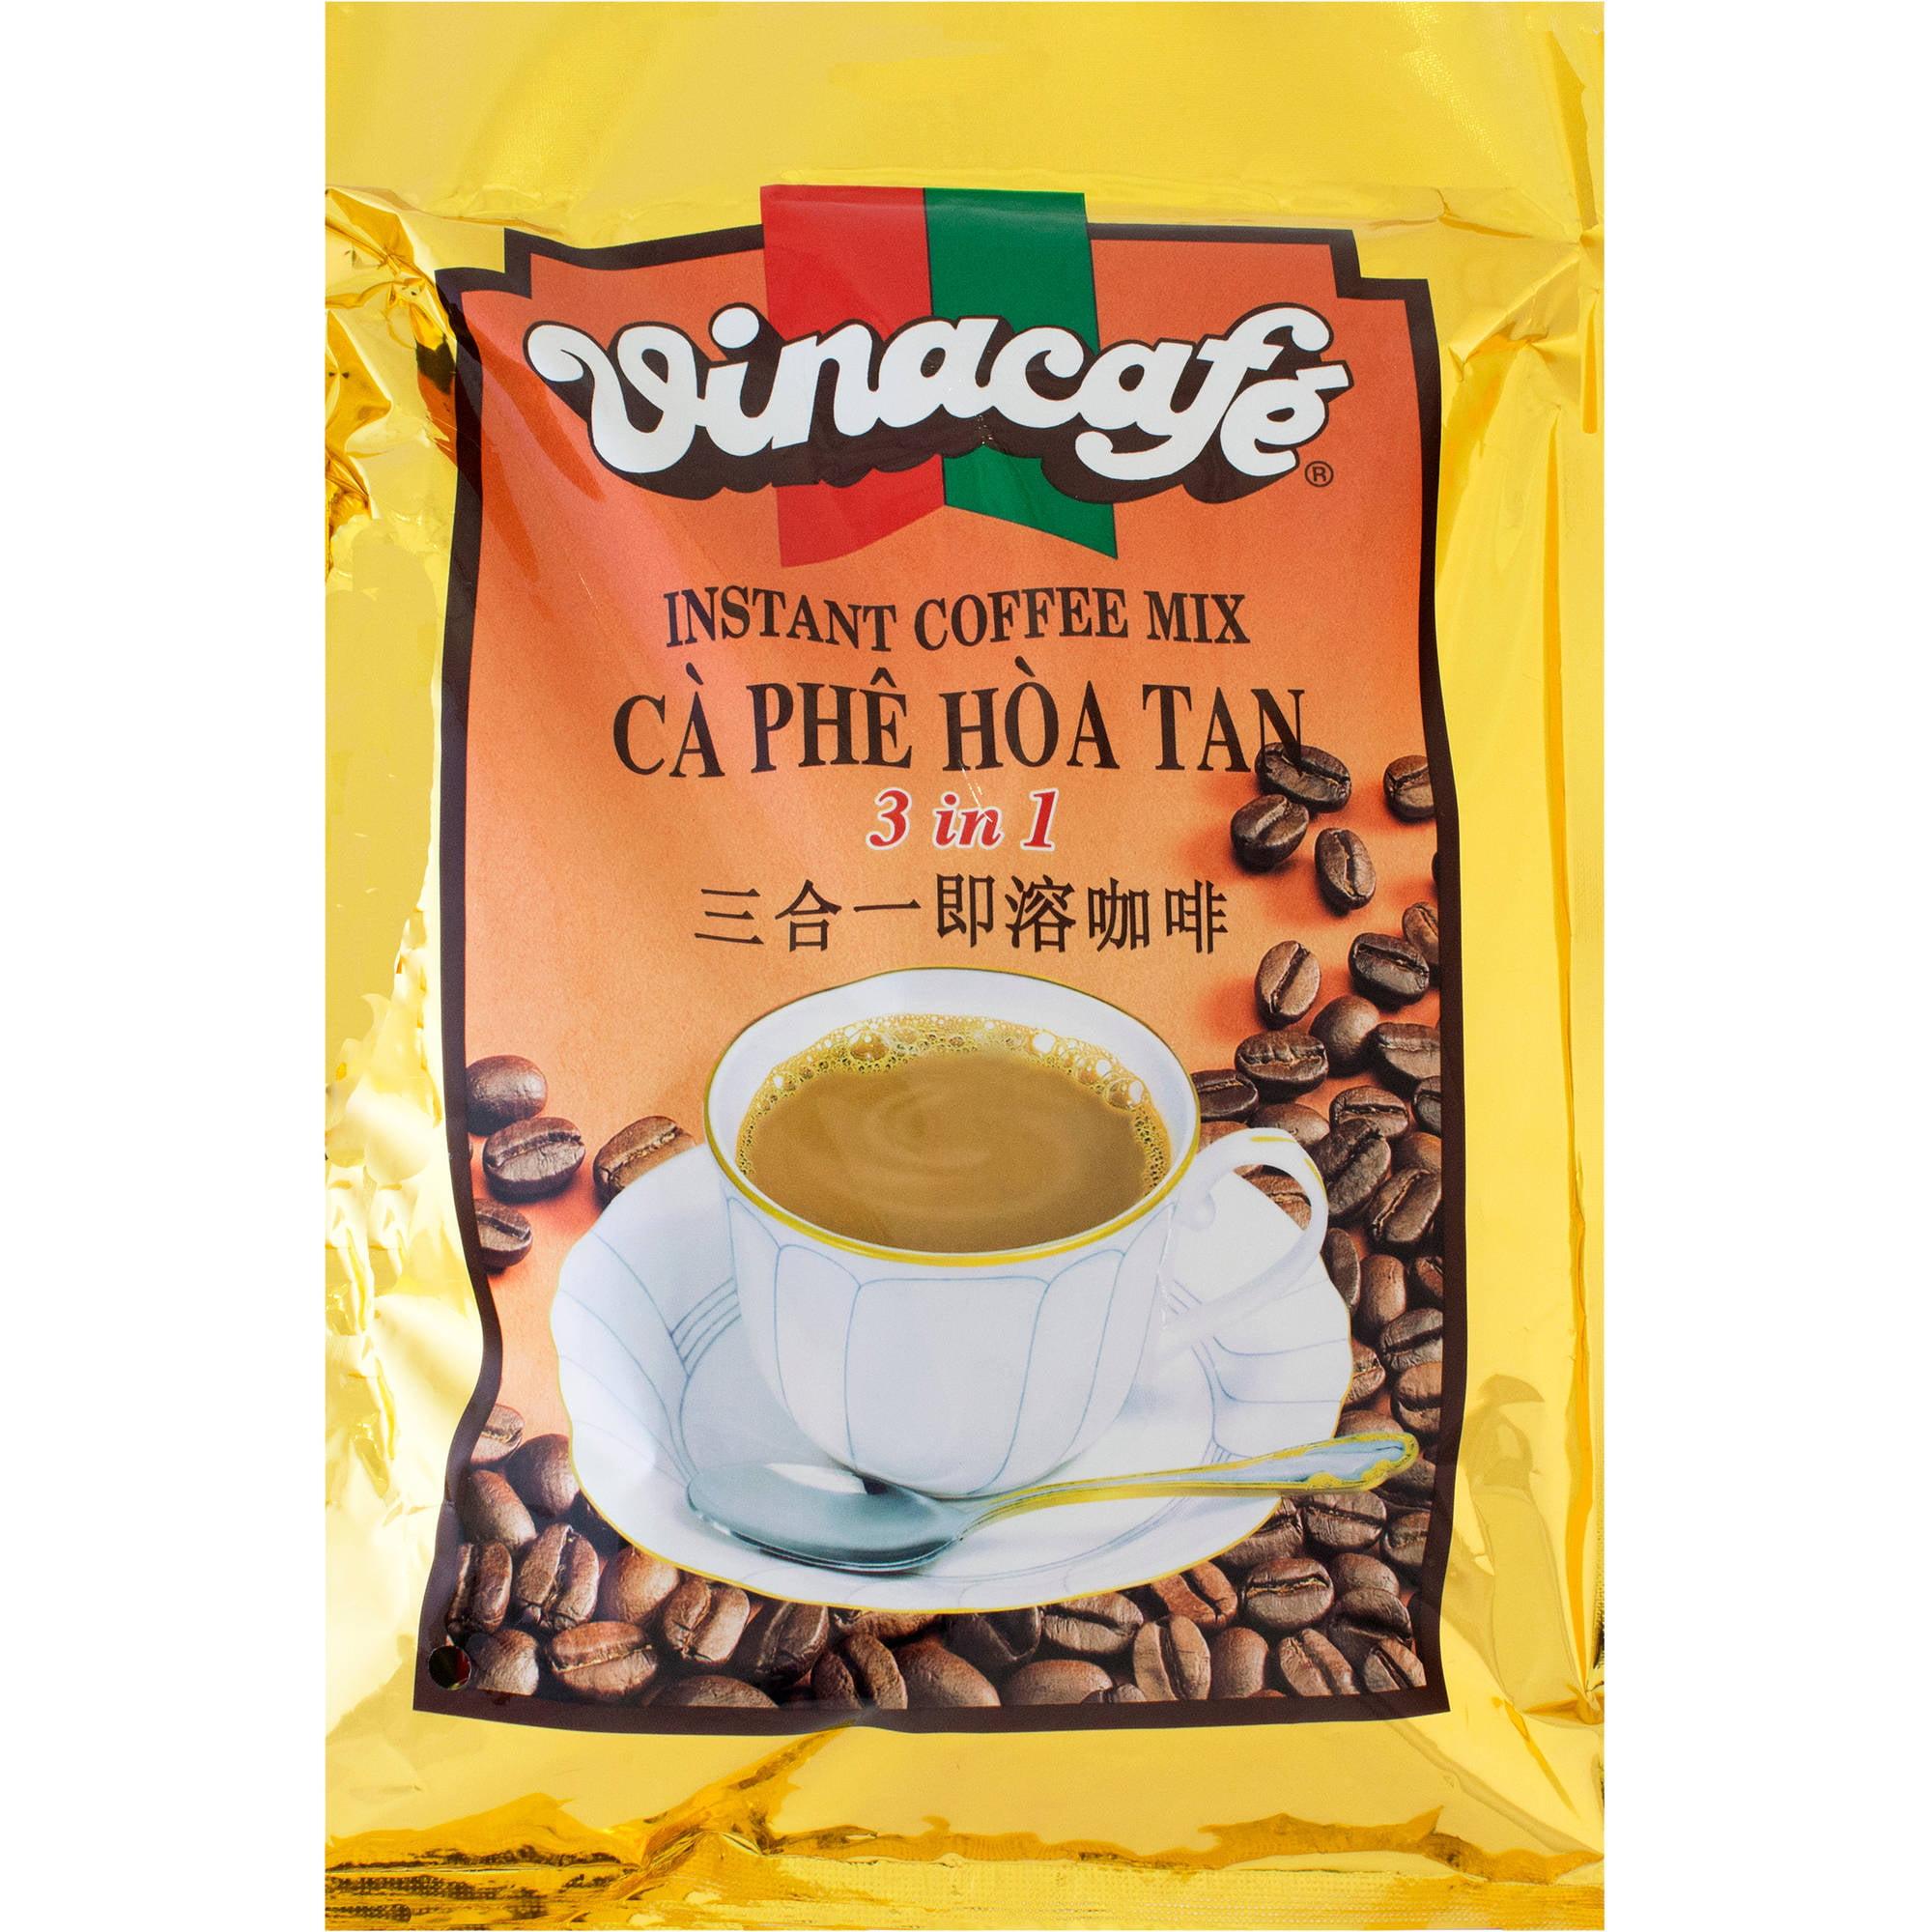 Vinacafe Instant Coffee Mix, 14.11 oz